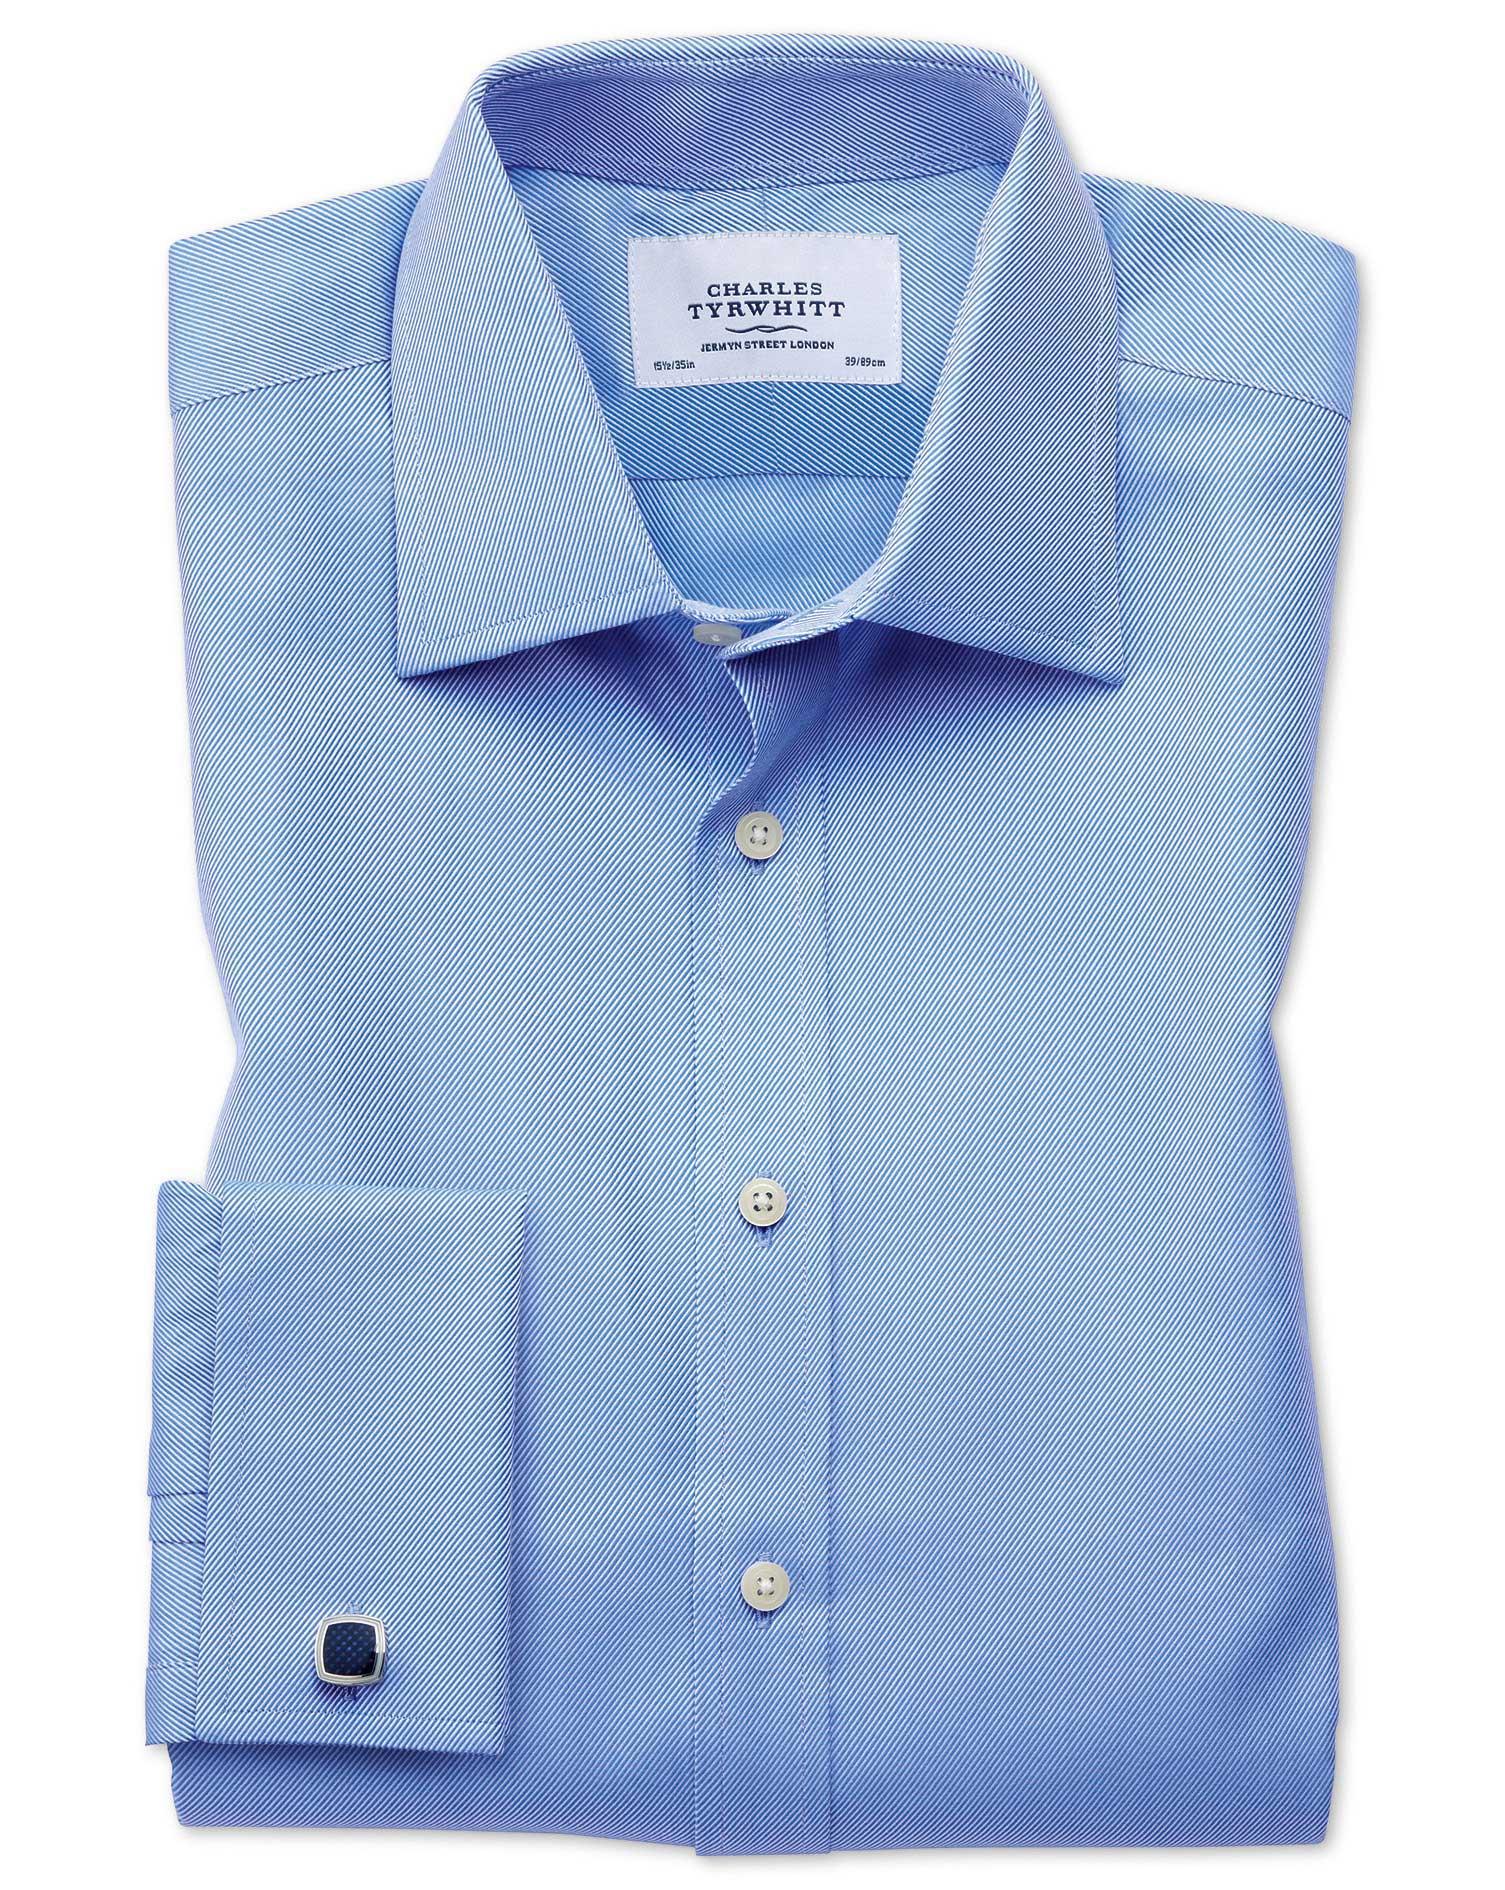 Slim Fit Egyptian Cotton Cavalry Twill Blue Formal Shirt Single Cuff Size 17/38 by Charles Tyrwhitt